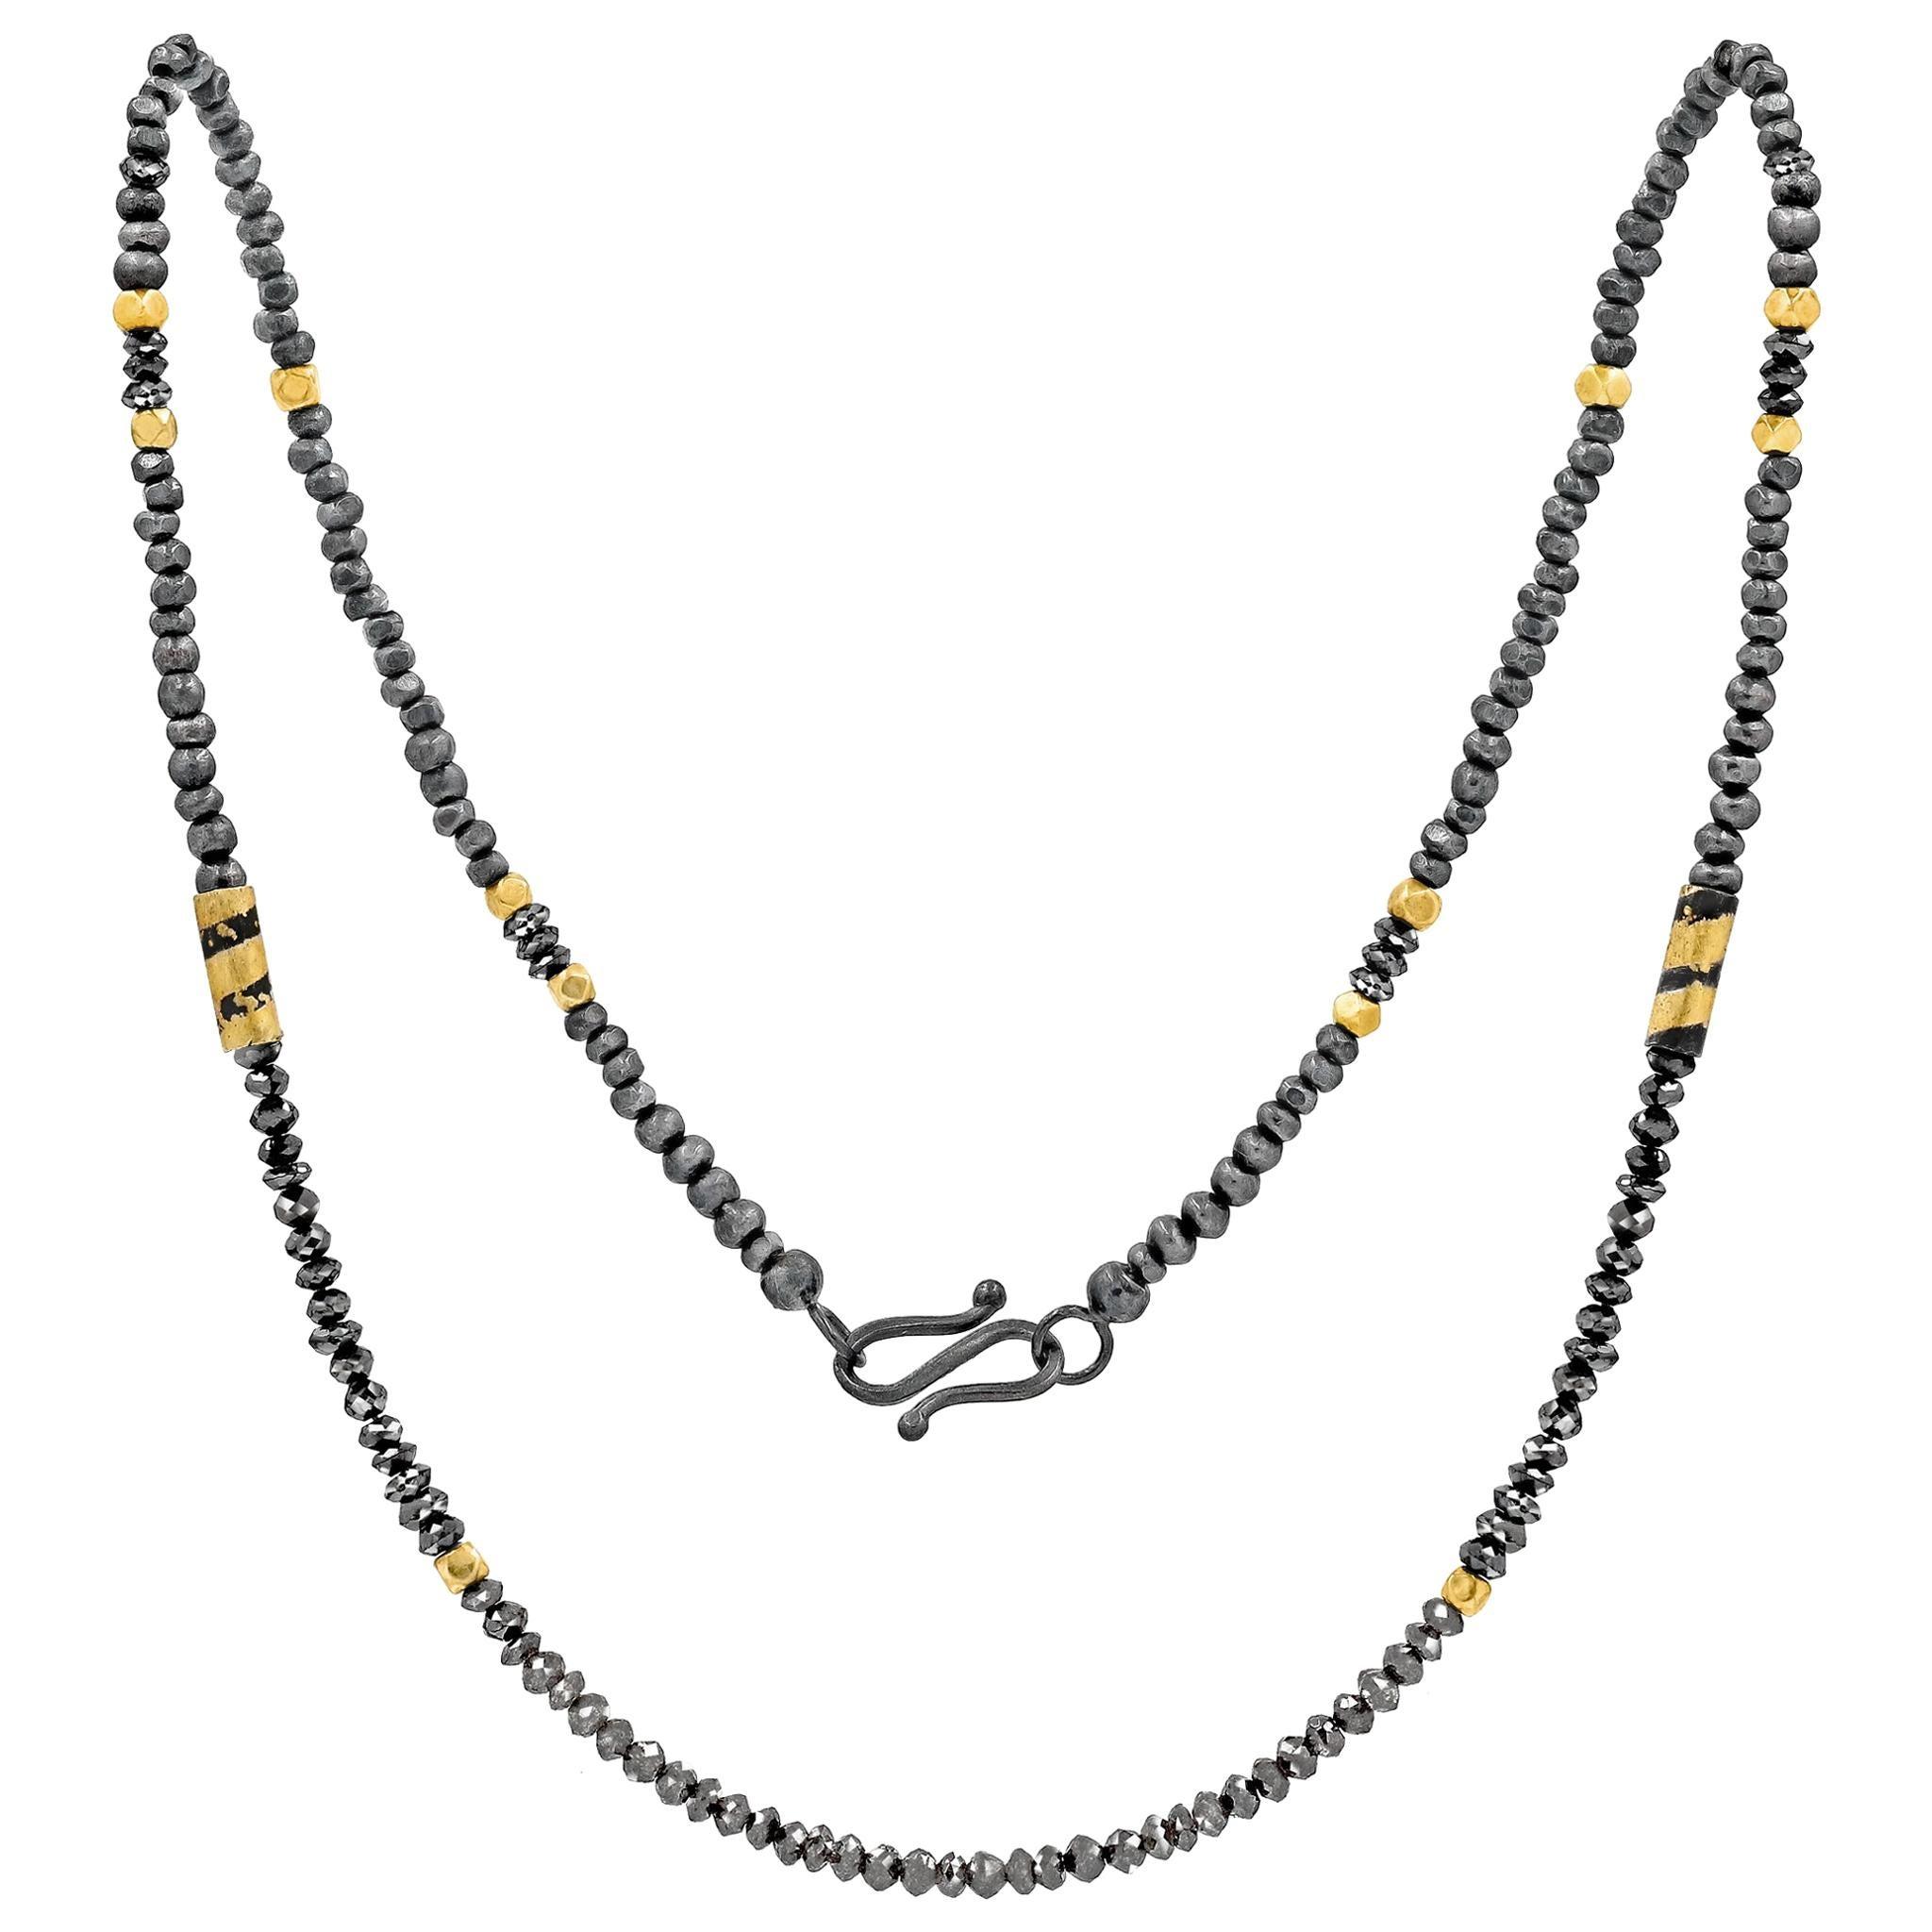 Atelier Zobel Salt Pepper and Black Diamond Gold Oxidized Silver Dazzle Necklace